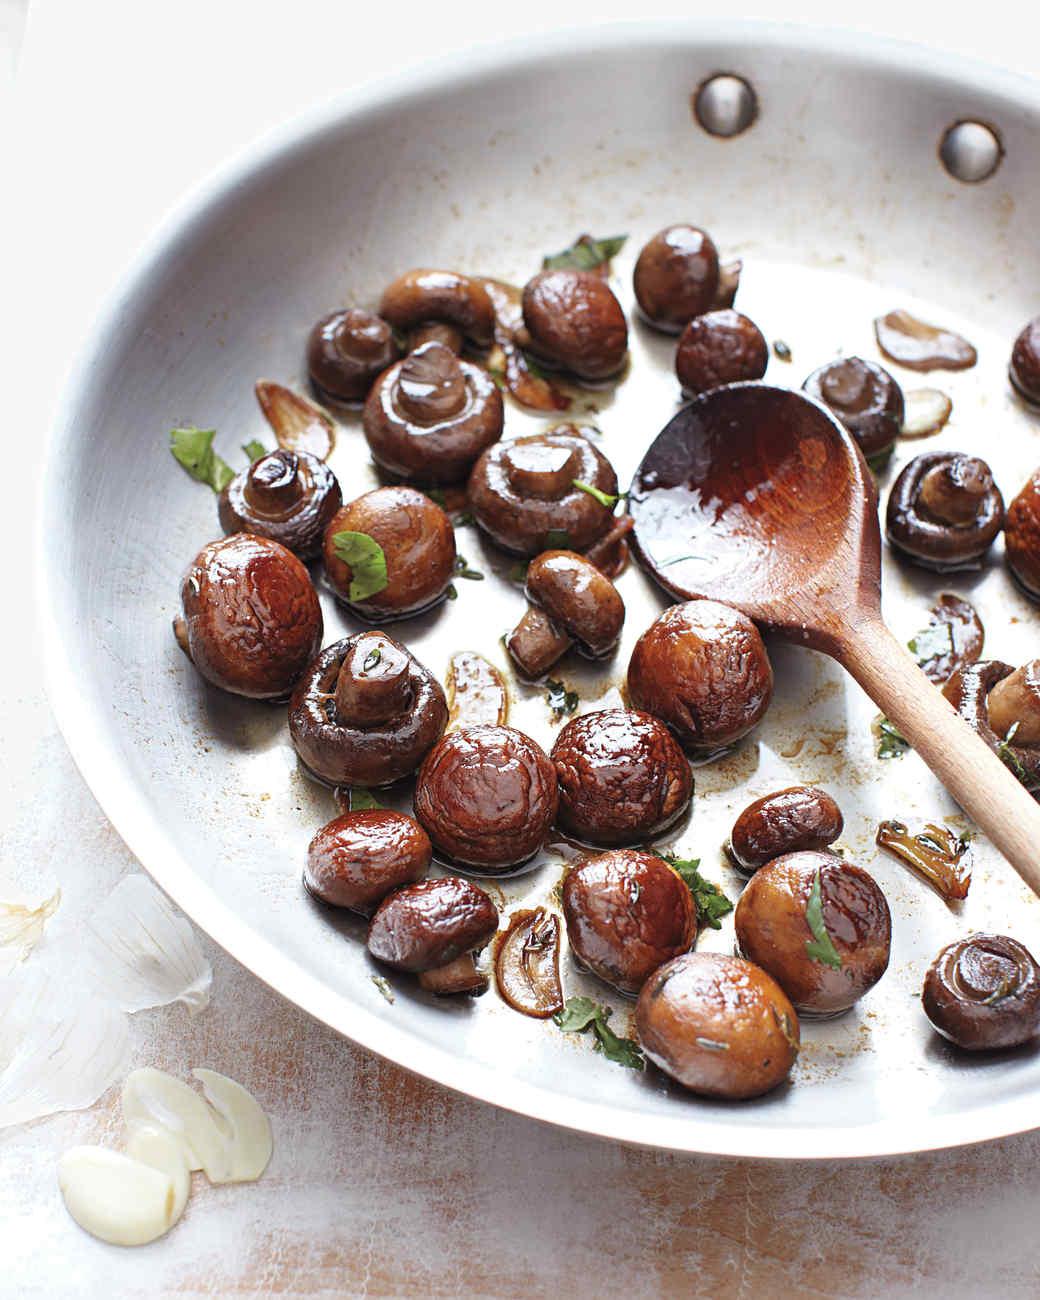 Sauteed Mushrooms with Herbs